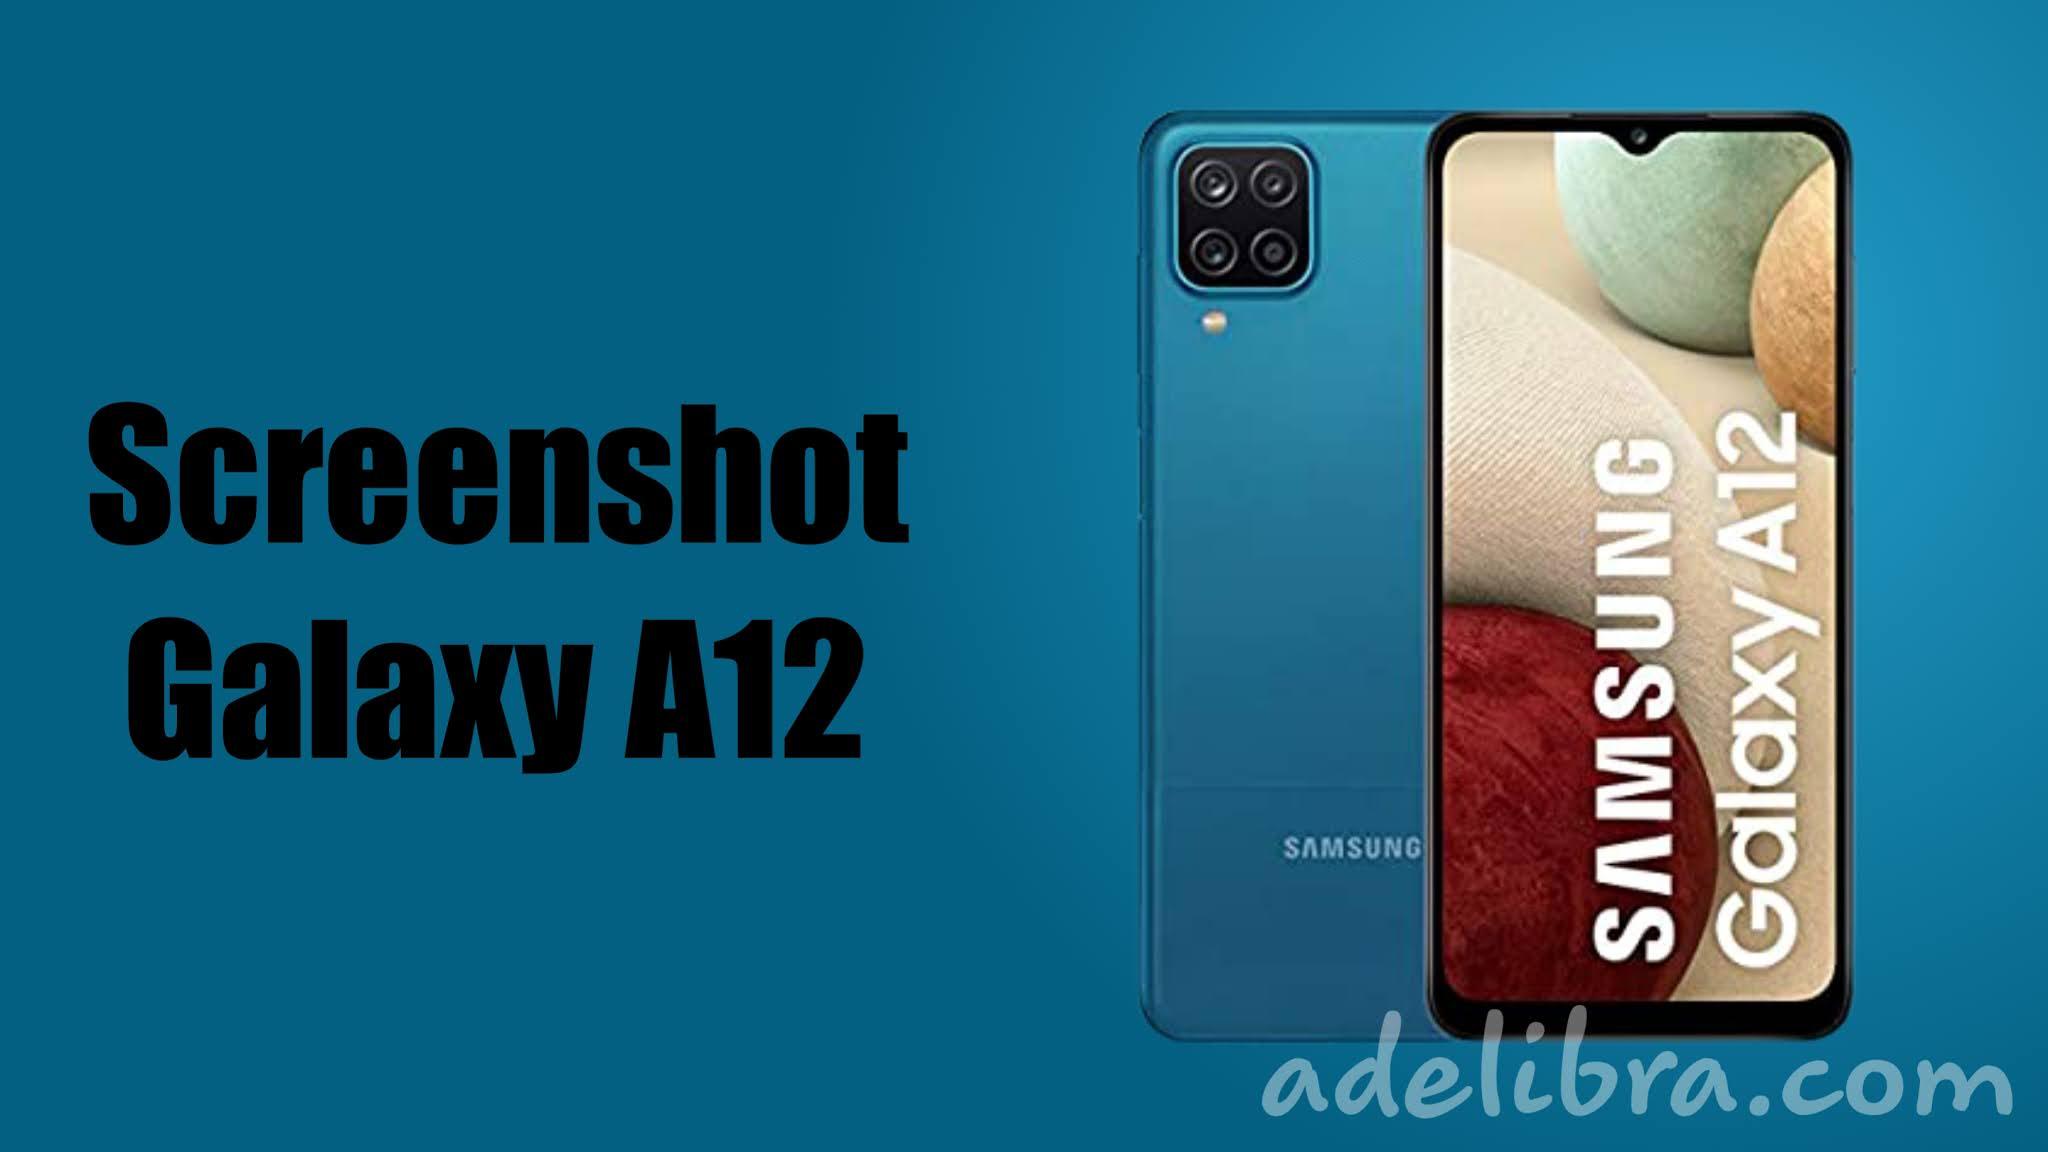 How to take Screenshot Samsung Galaxy A12